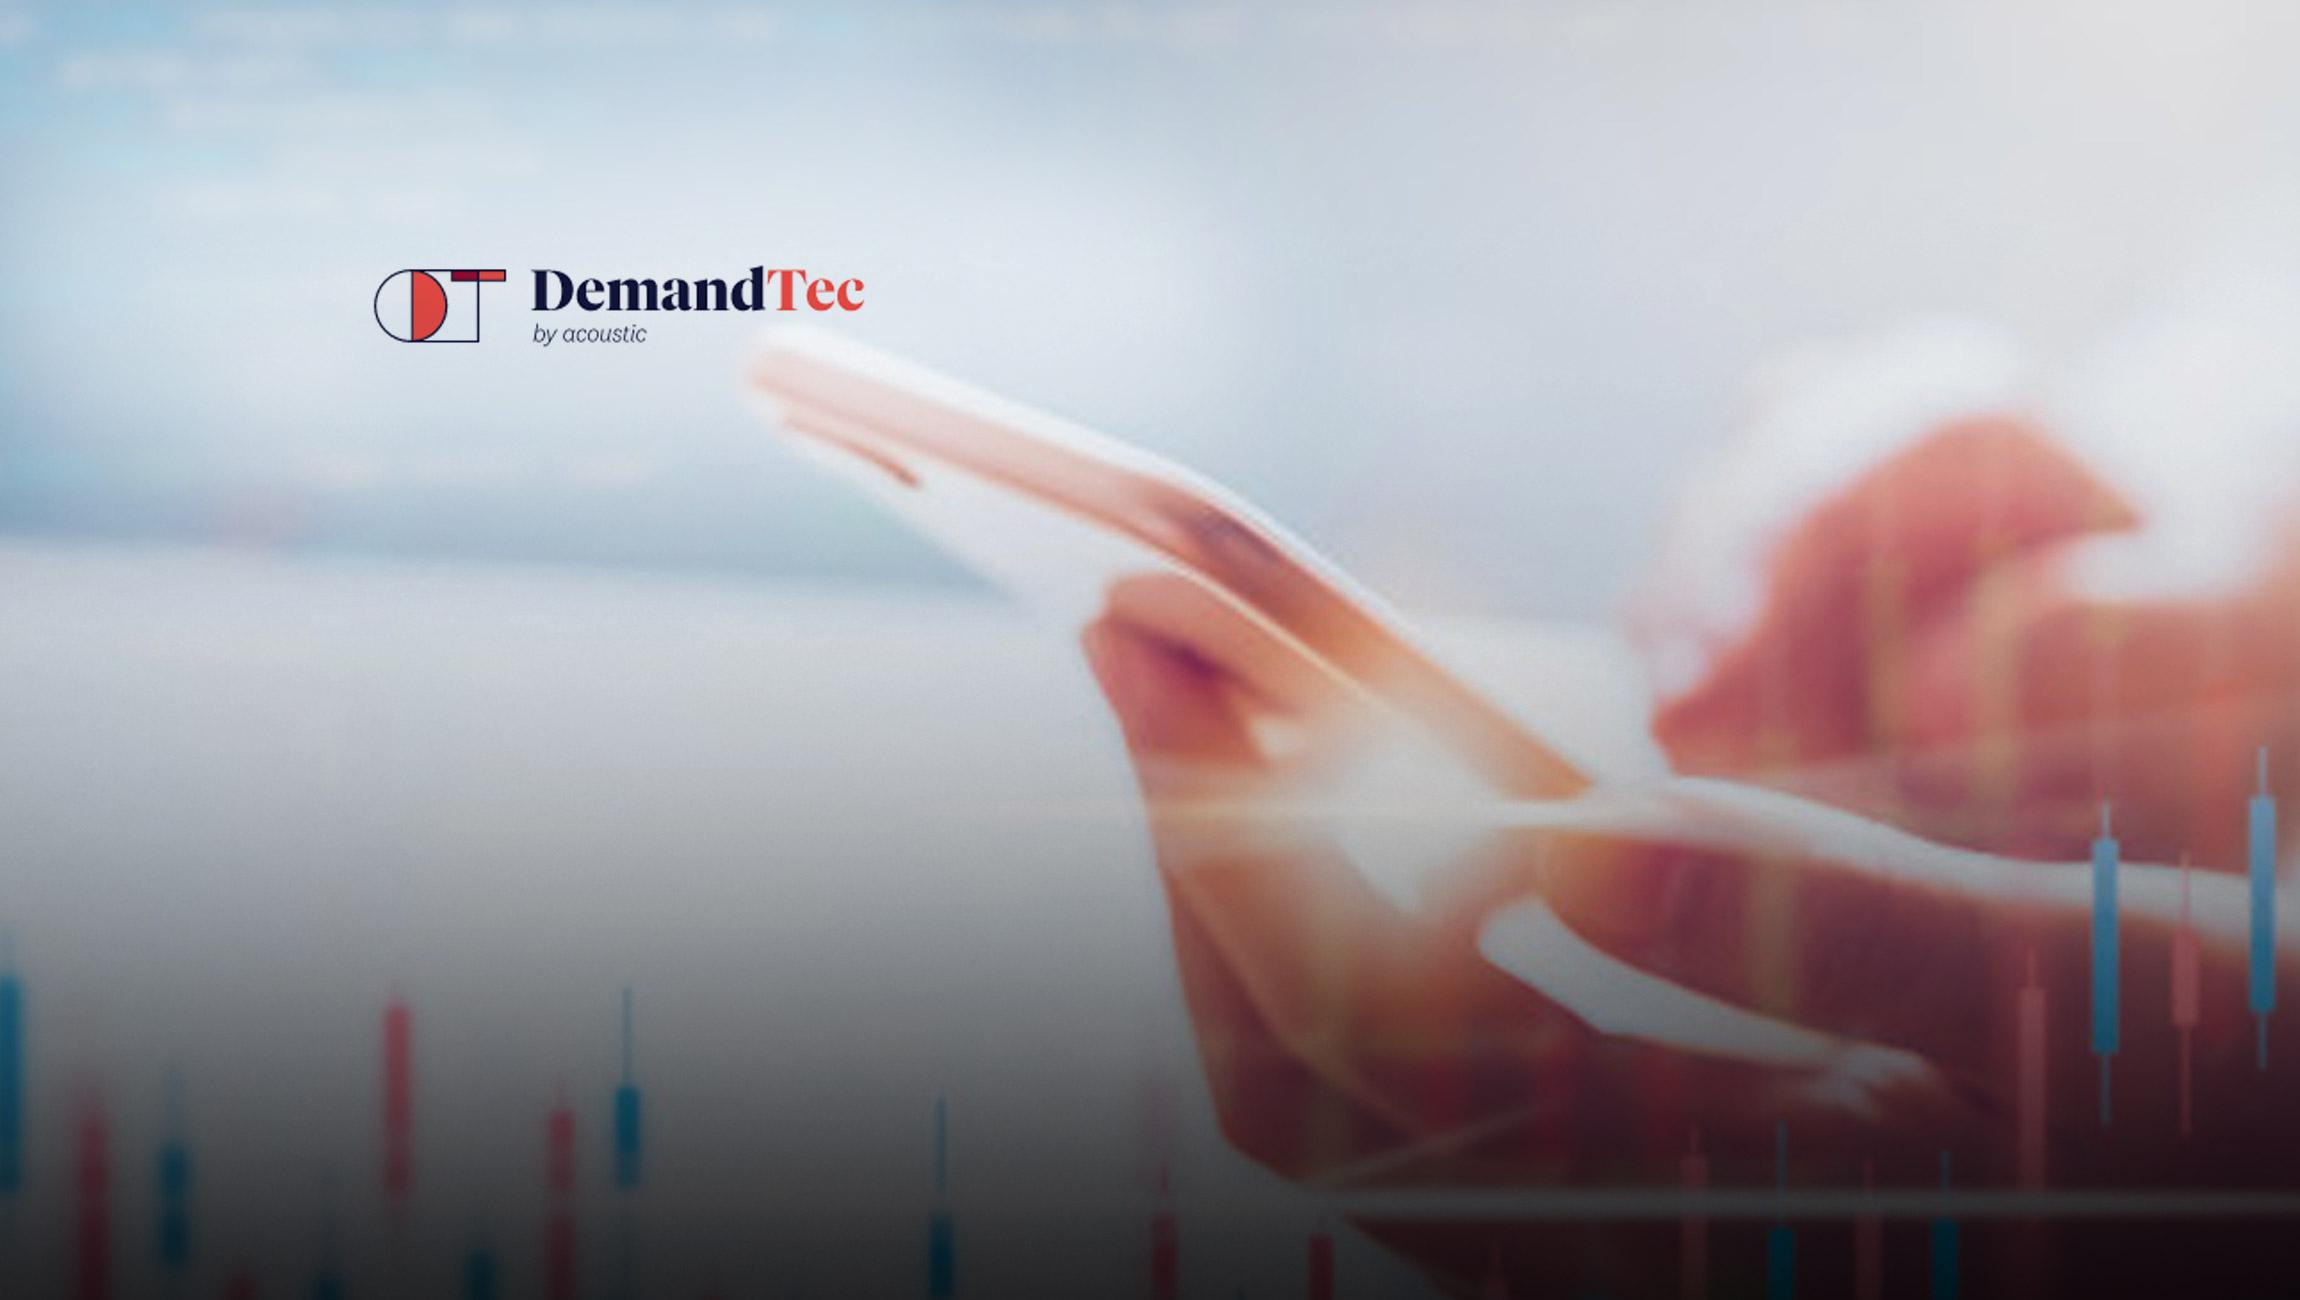 Cencosud Renews DemandTec Price Optimization